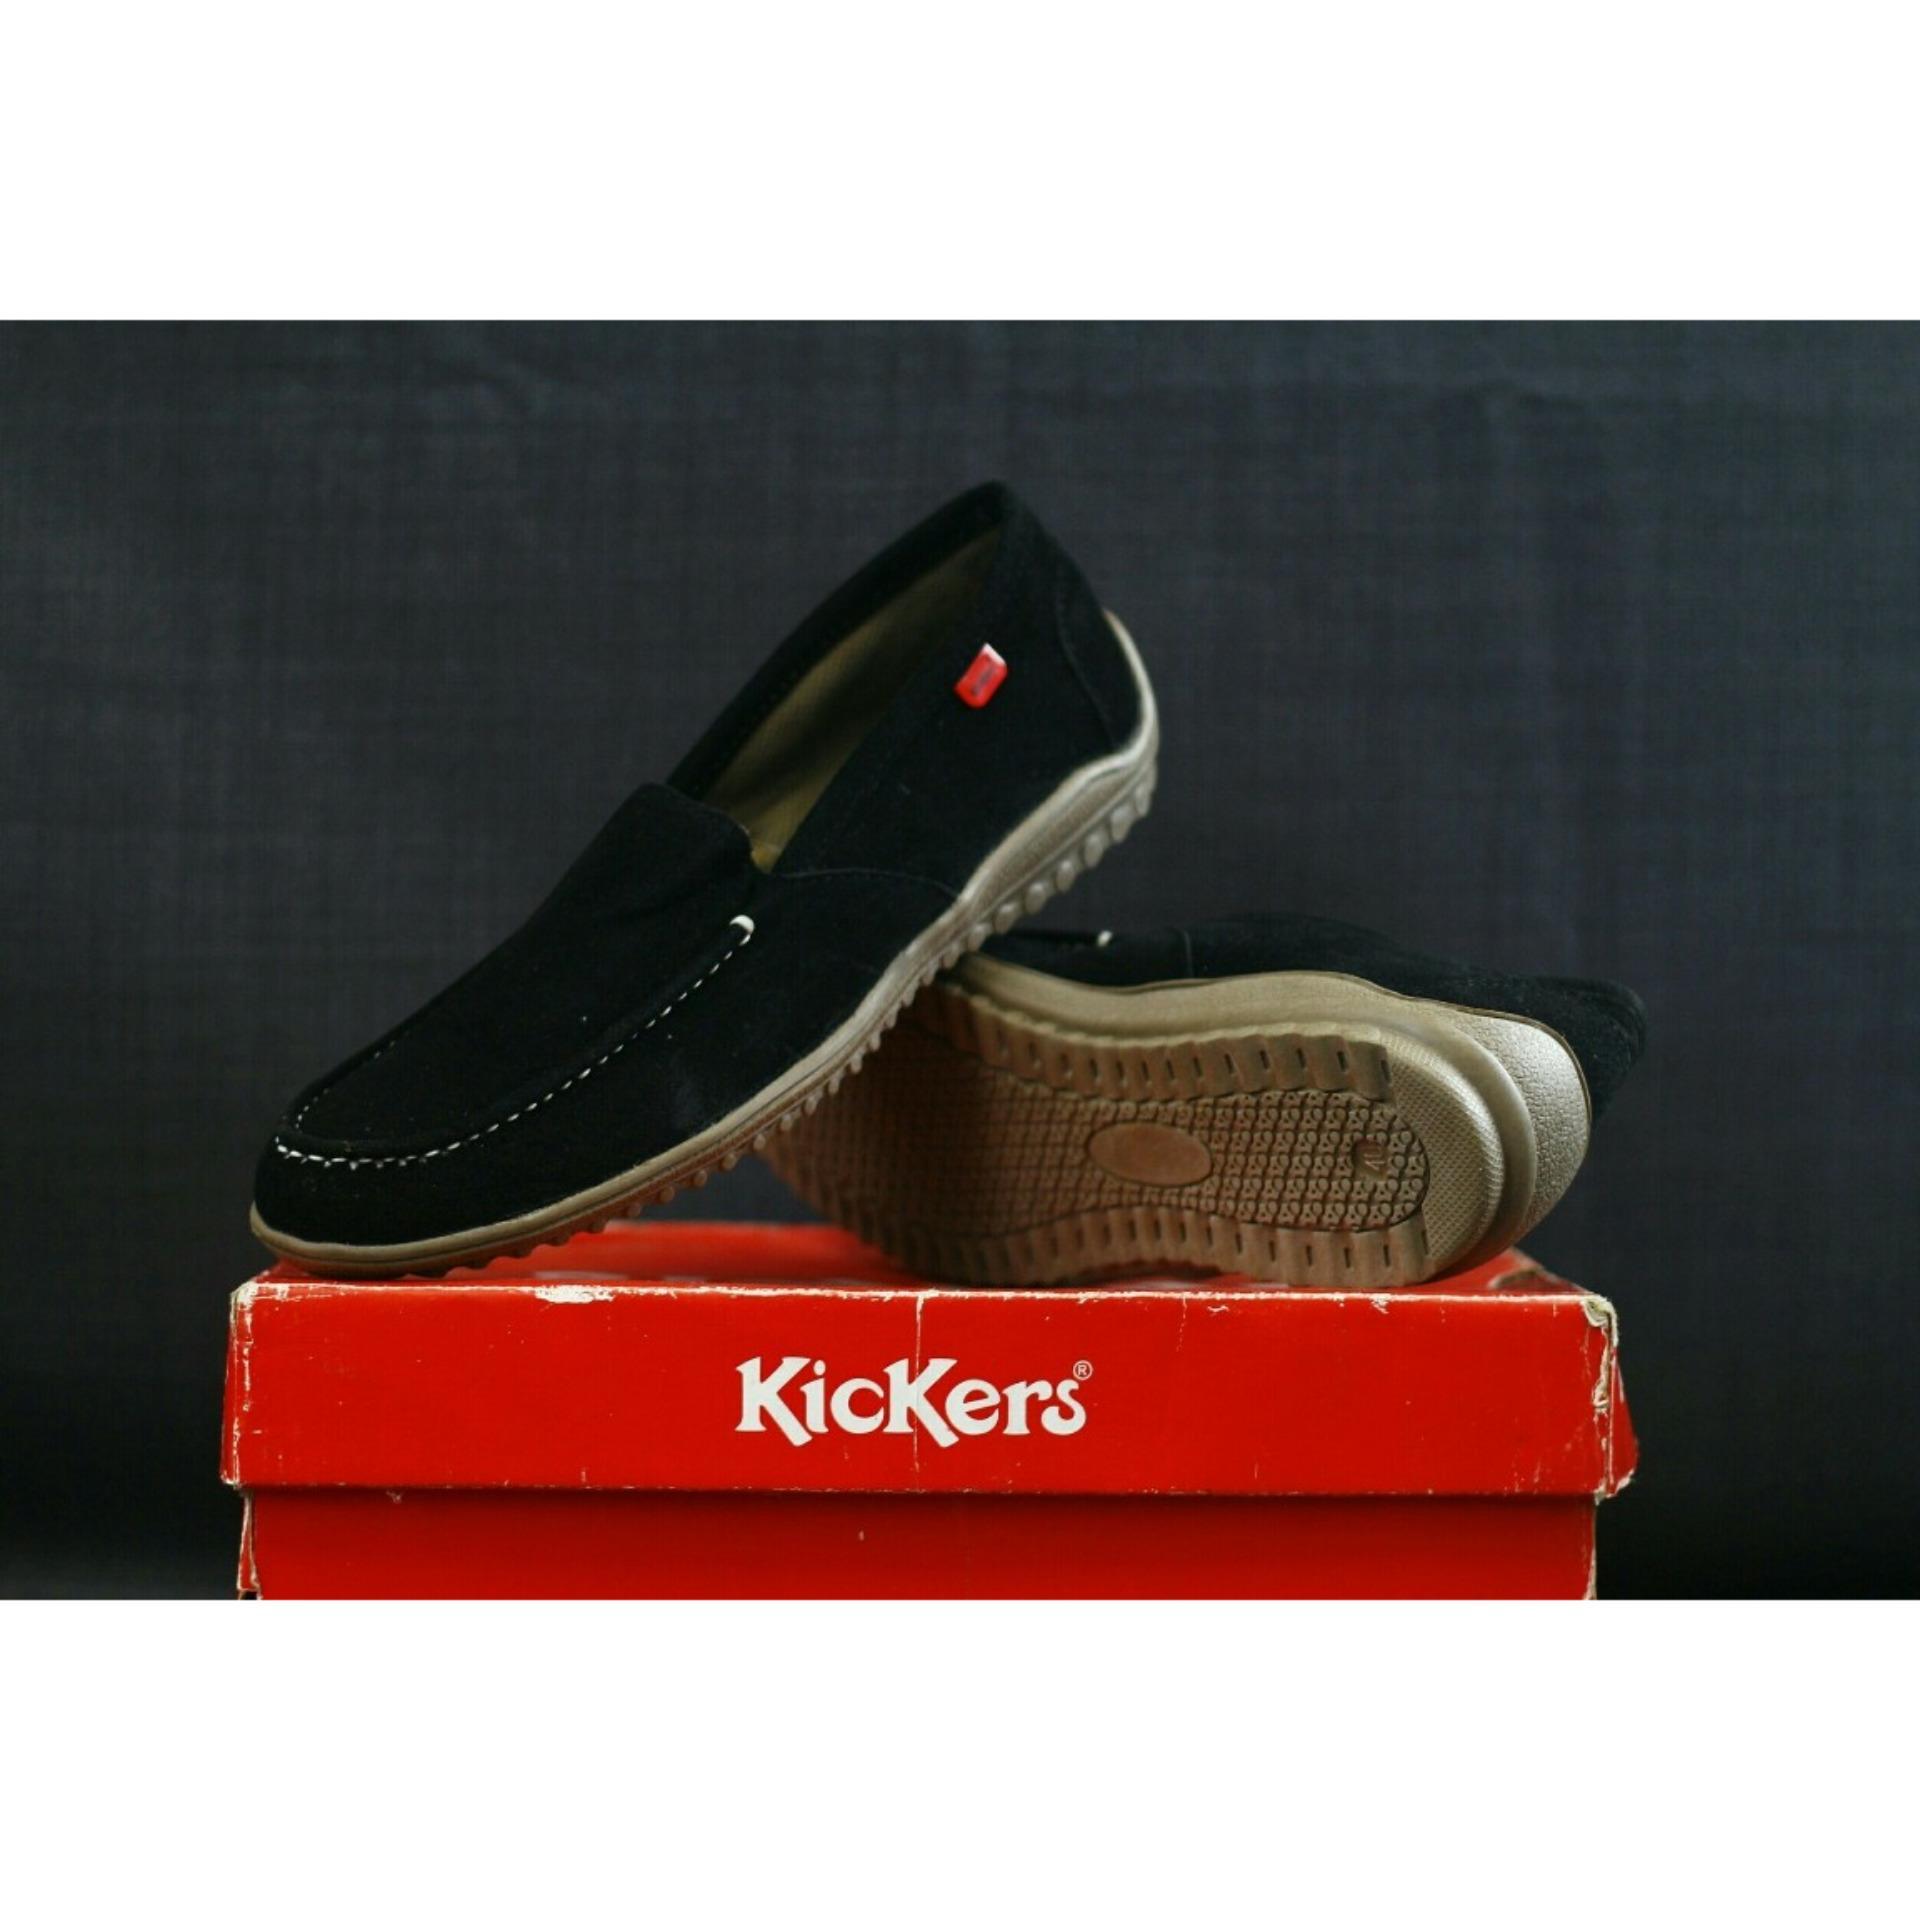 Miliki Segera Sepatu Casual Kickers Pria Black